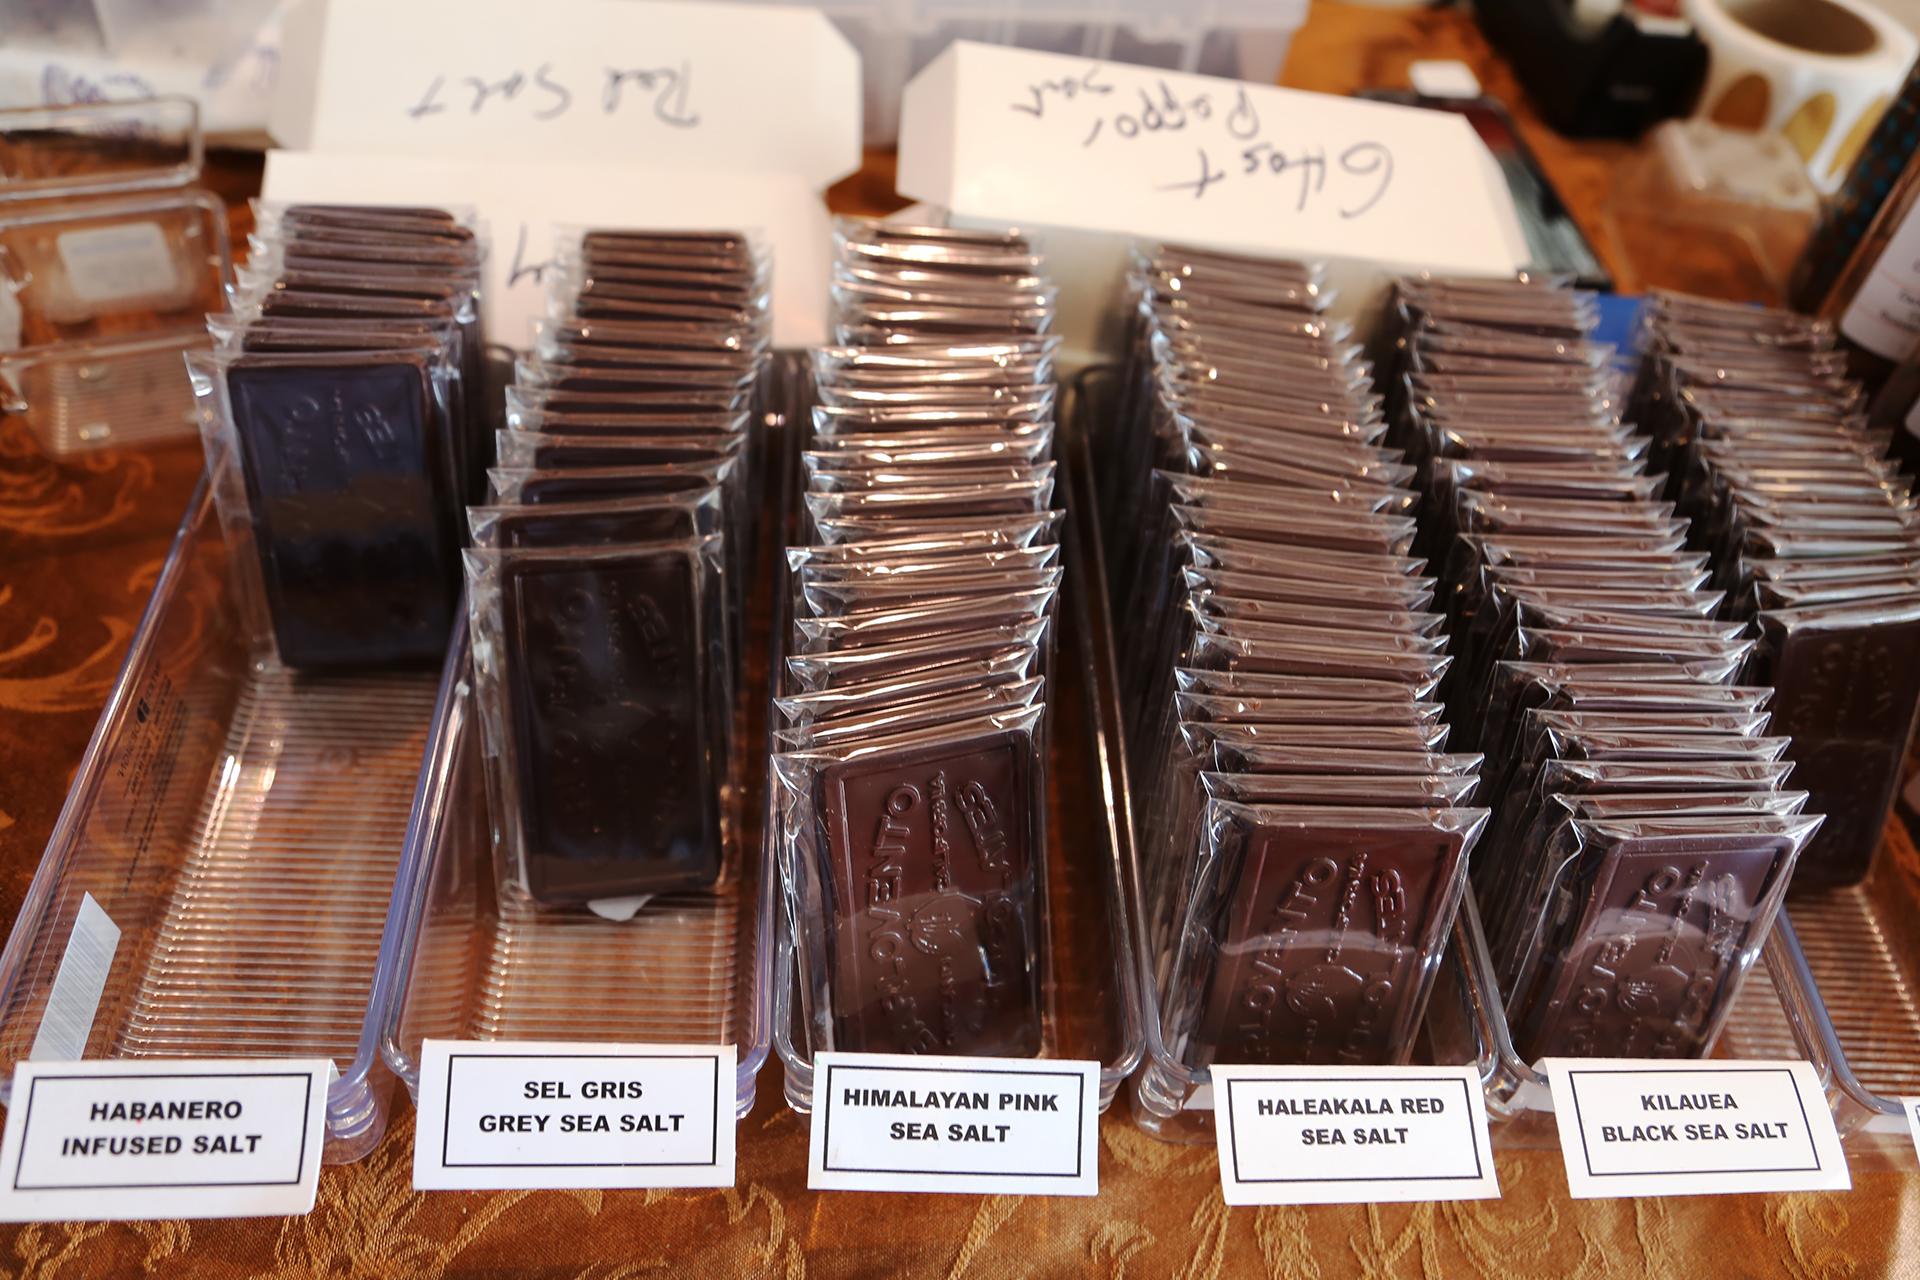 Barlovento Chocolate: Habanero chocolate bar and other flavors